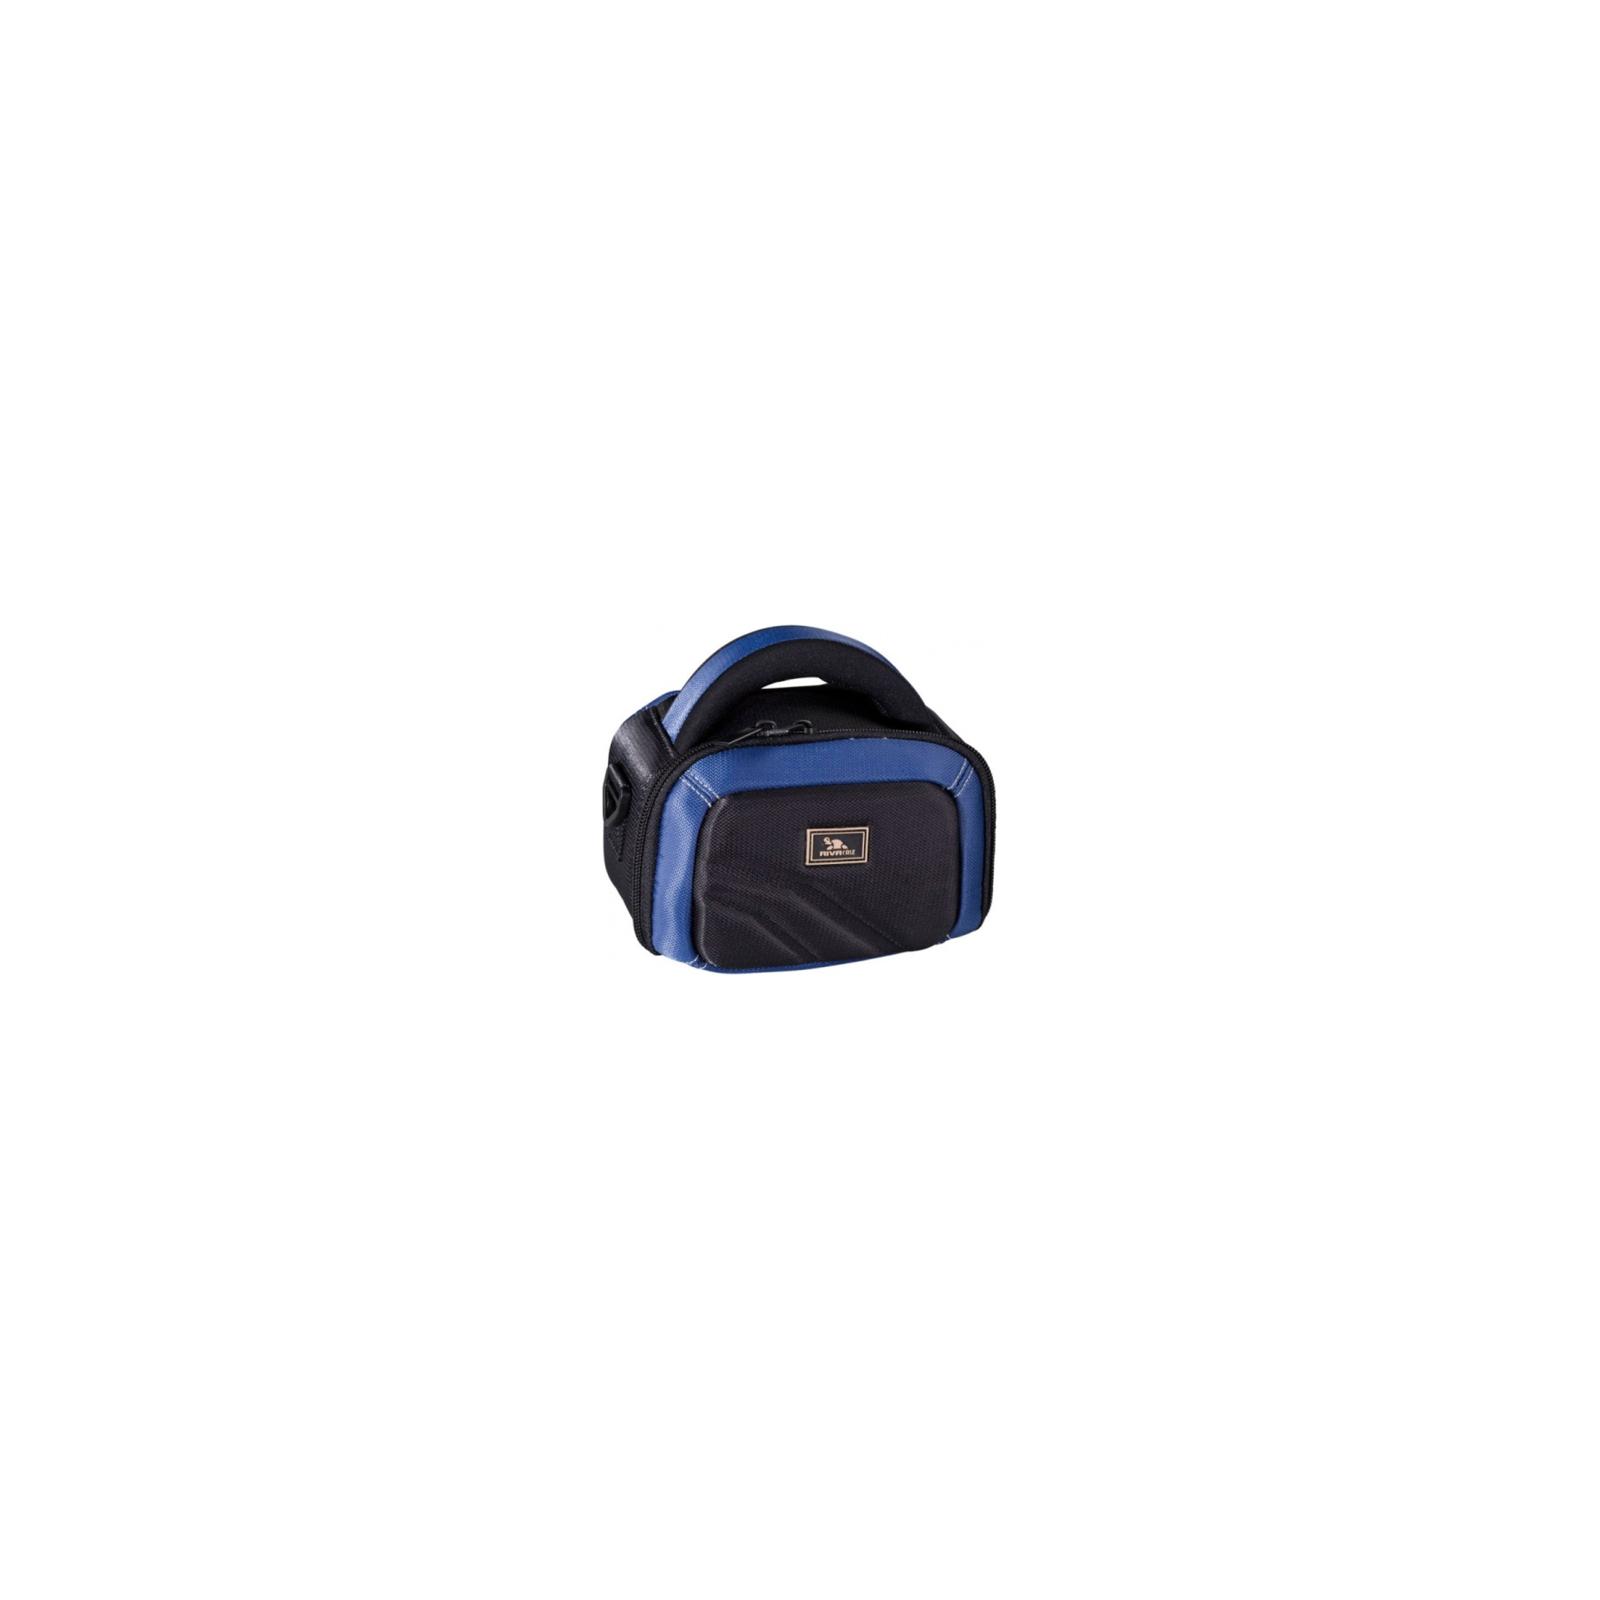 Фото-сумка RivaCase Video Case (7124-S(PS) sapphire blue)